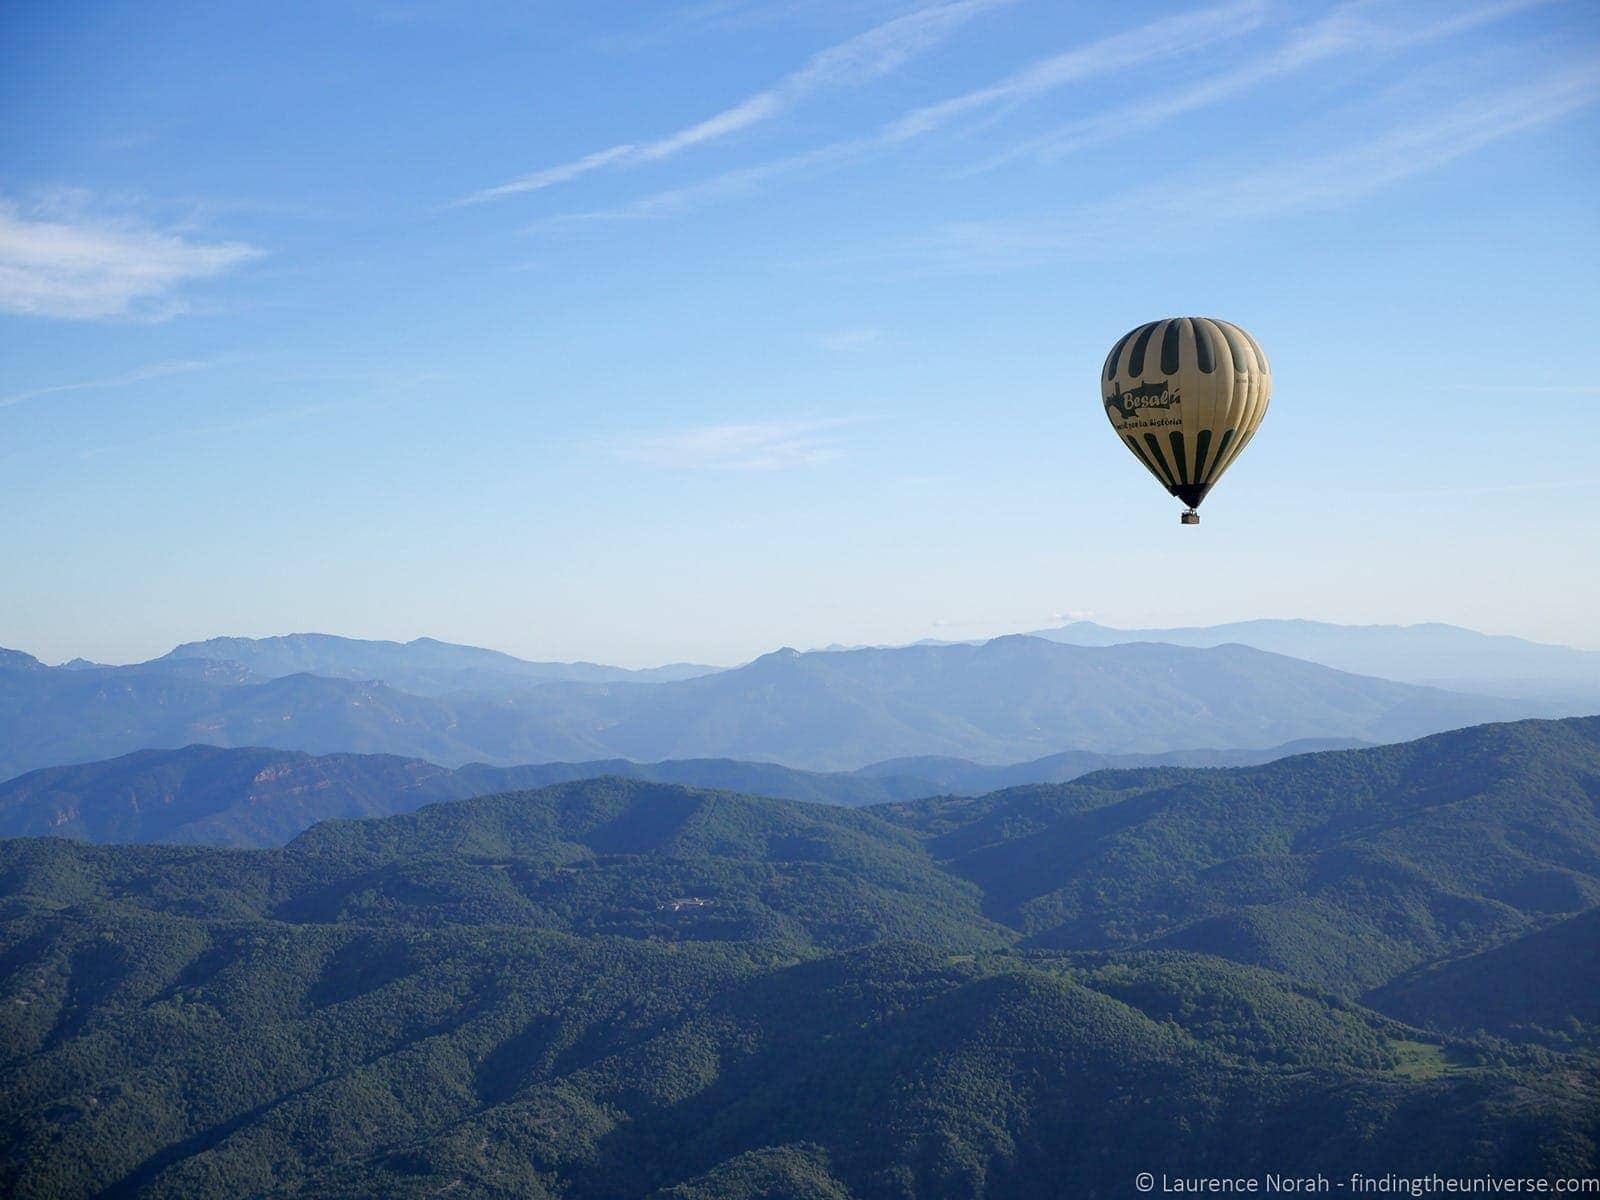 Balloon Vol de Coloms Costa Brava 28